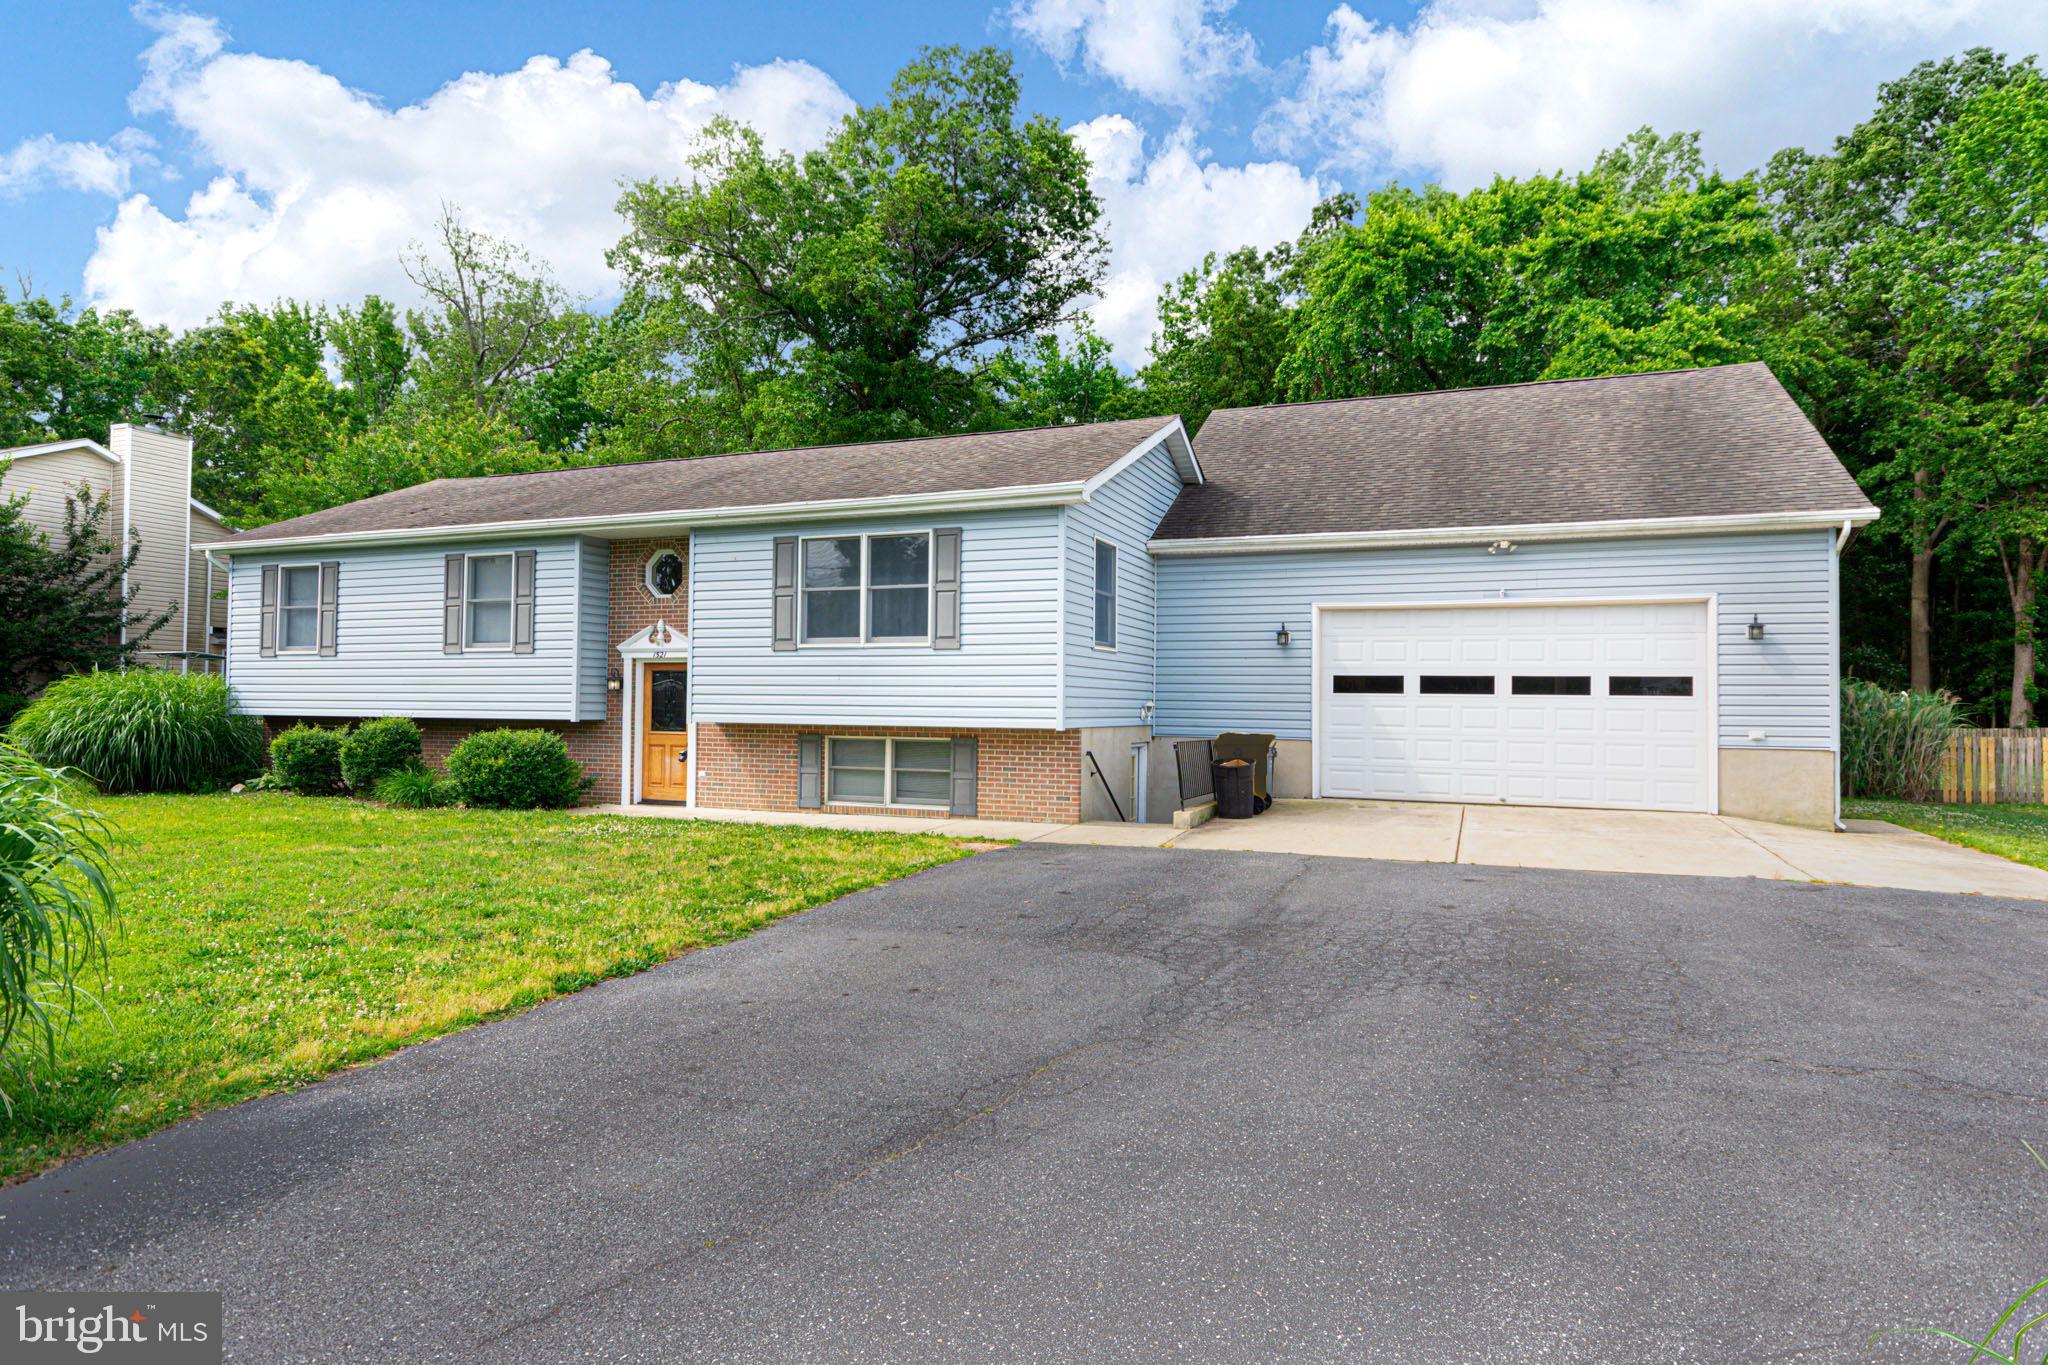 1521 Warfield Rd, Edgewater, MD, 21037